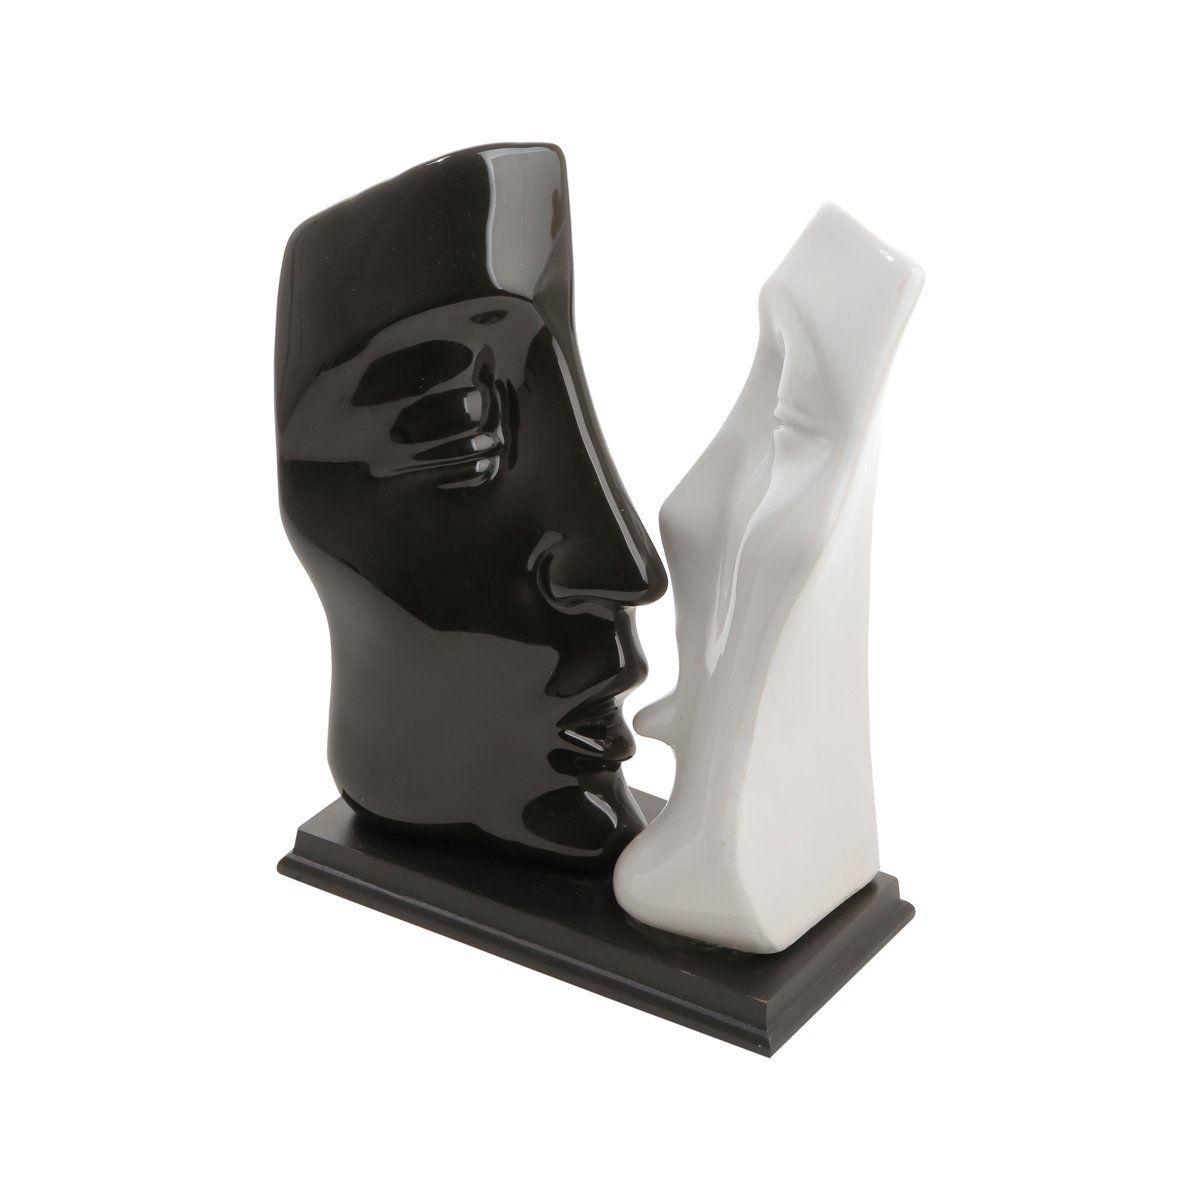 Estatueta 29,5 cm de cerâmica branco e preto Casal Namorados Beijo Prestige - 1816